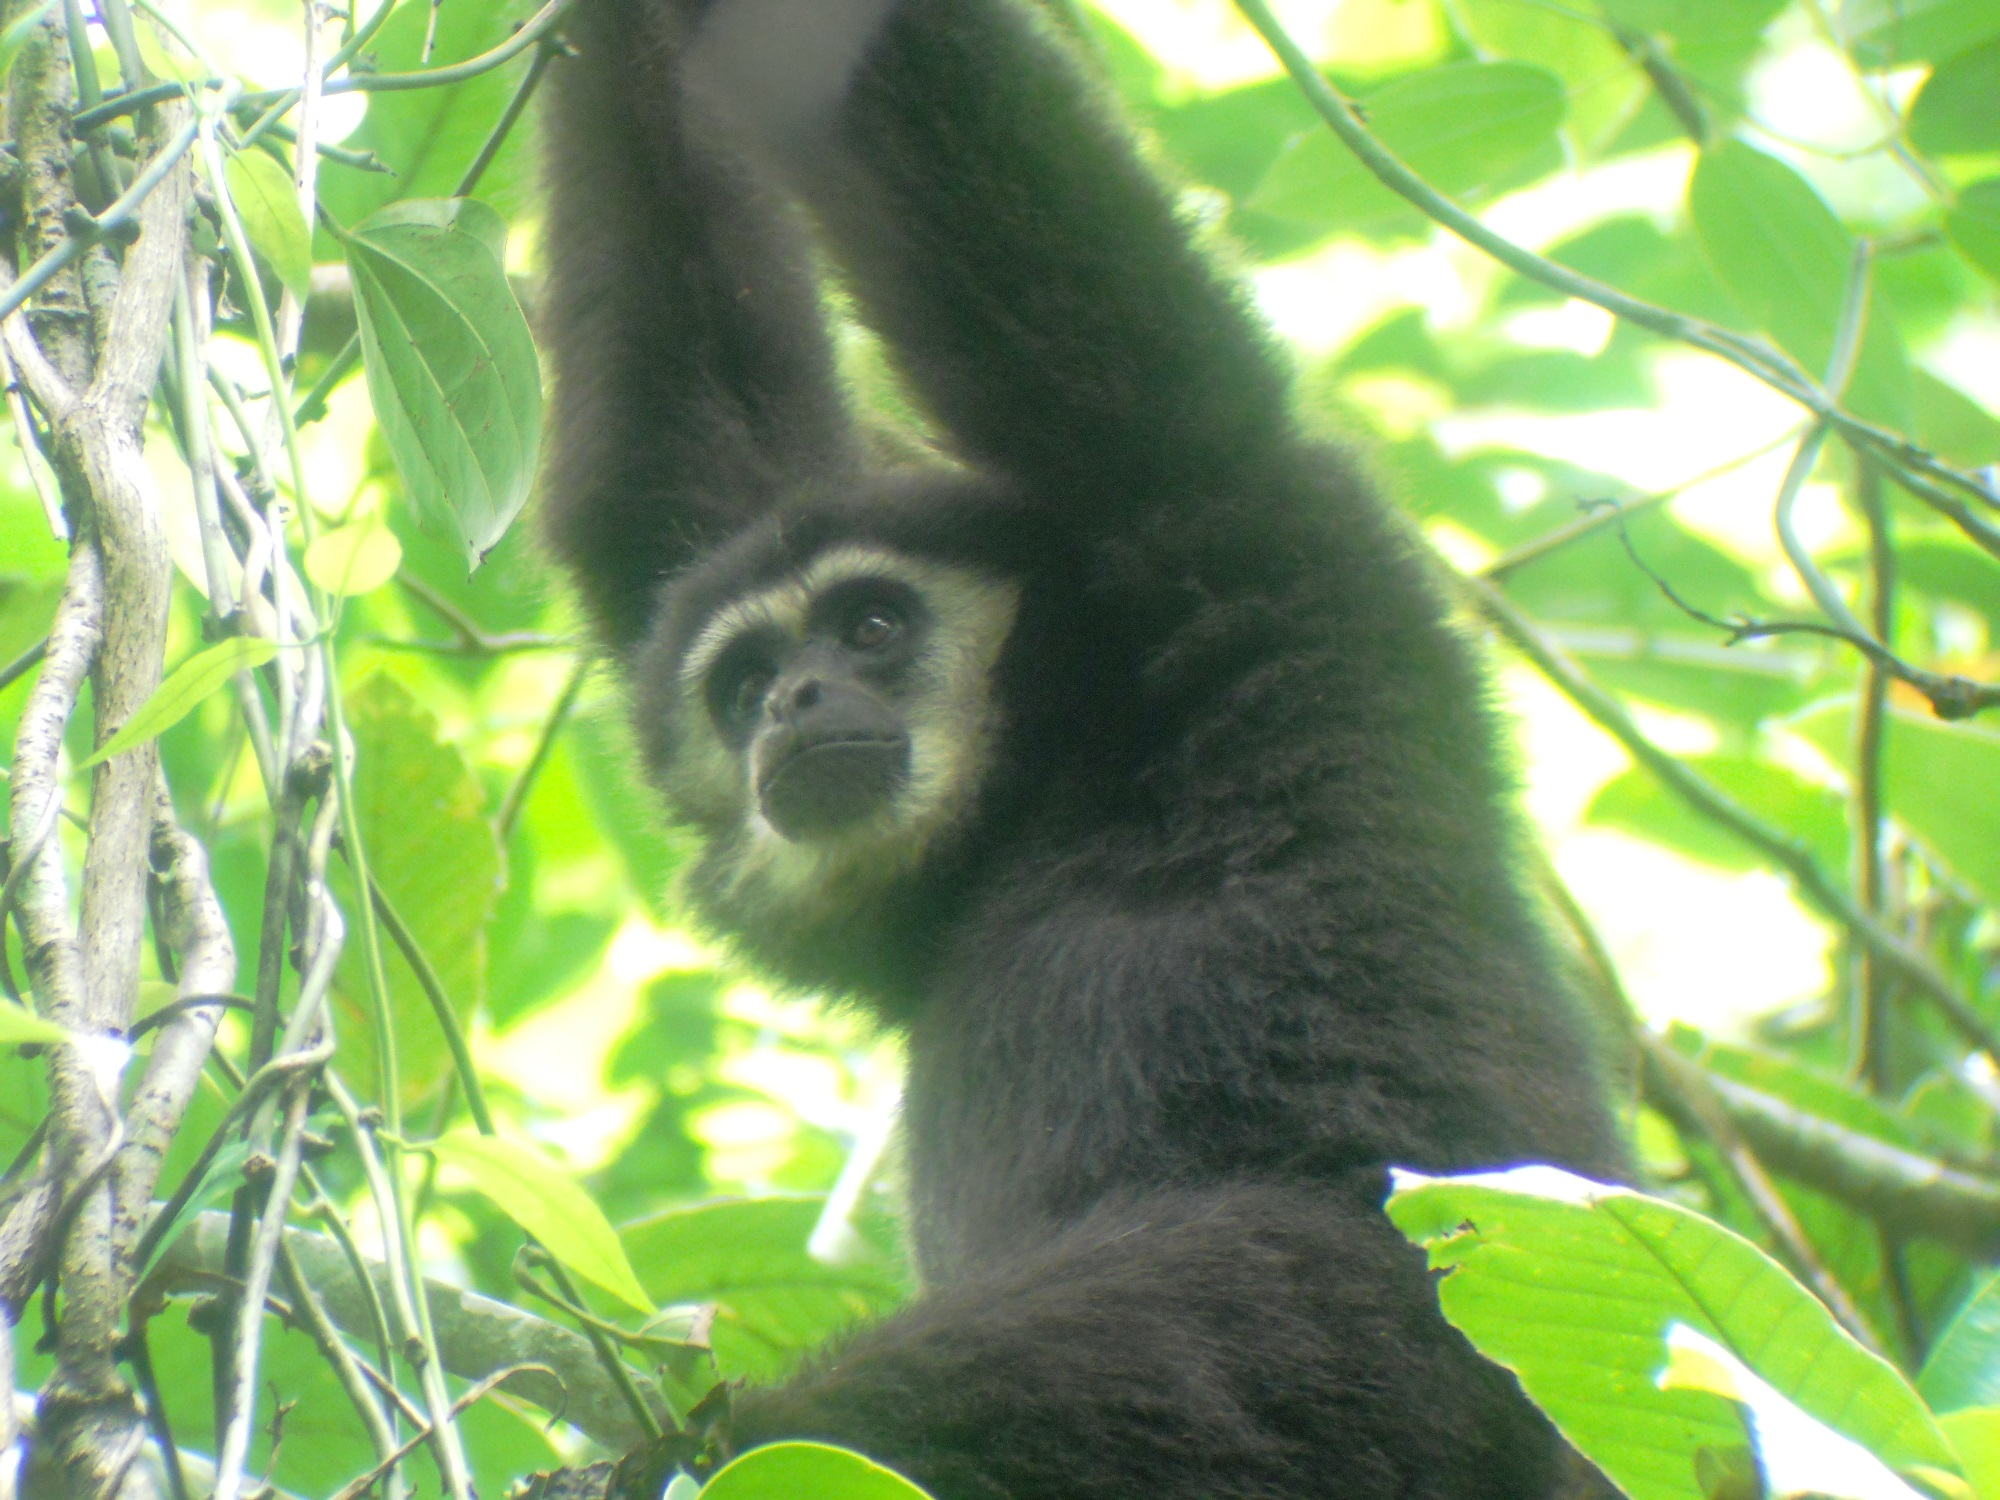 A White Handed Gibbon In Thailands Khao Yai National Park, Like